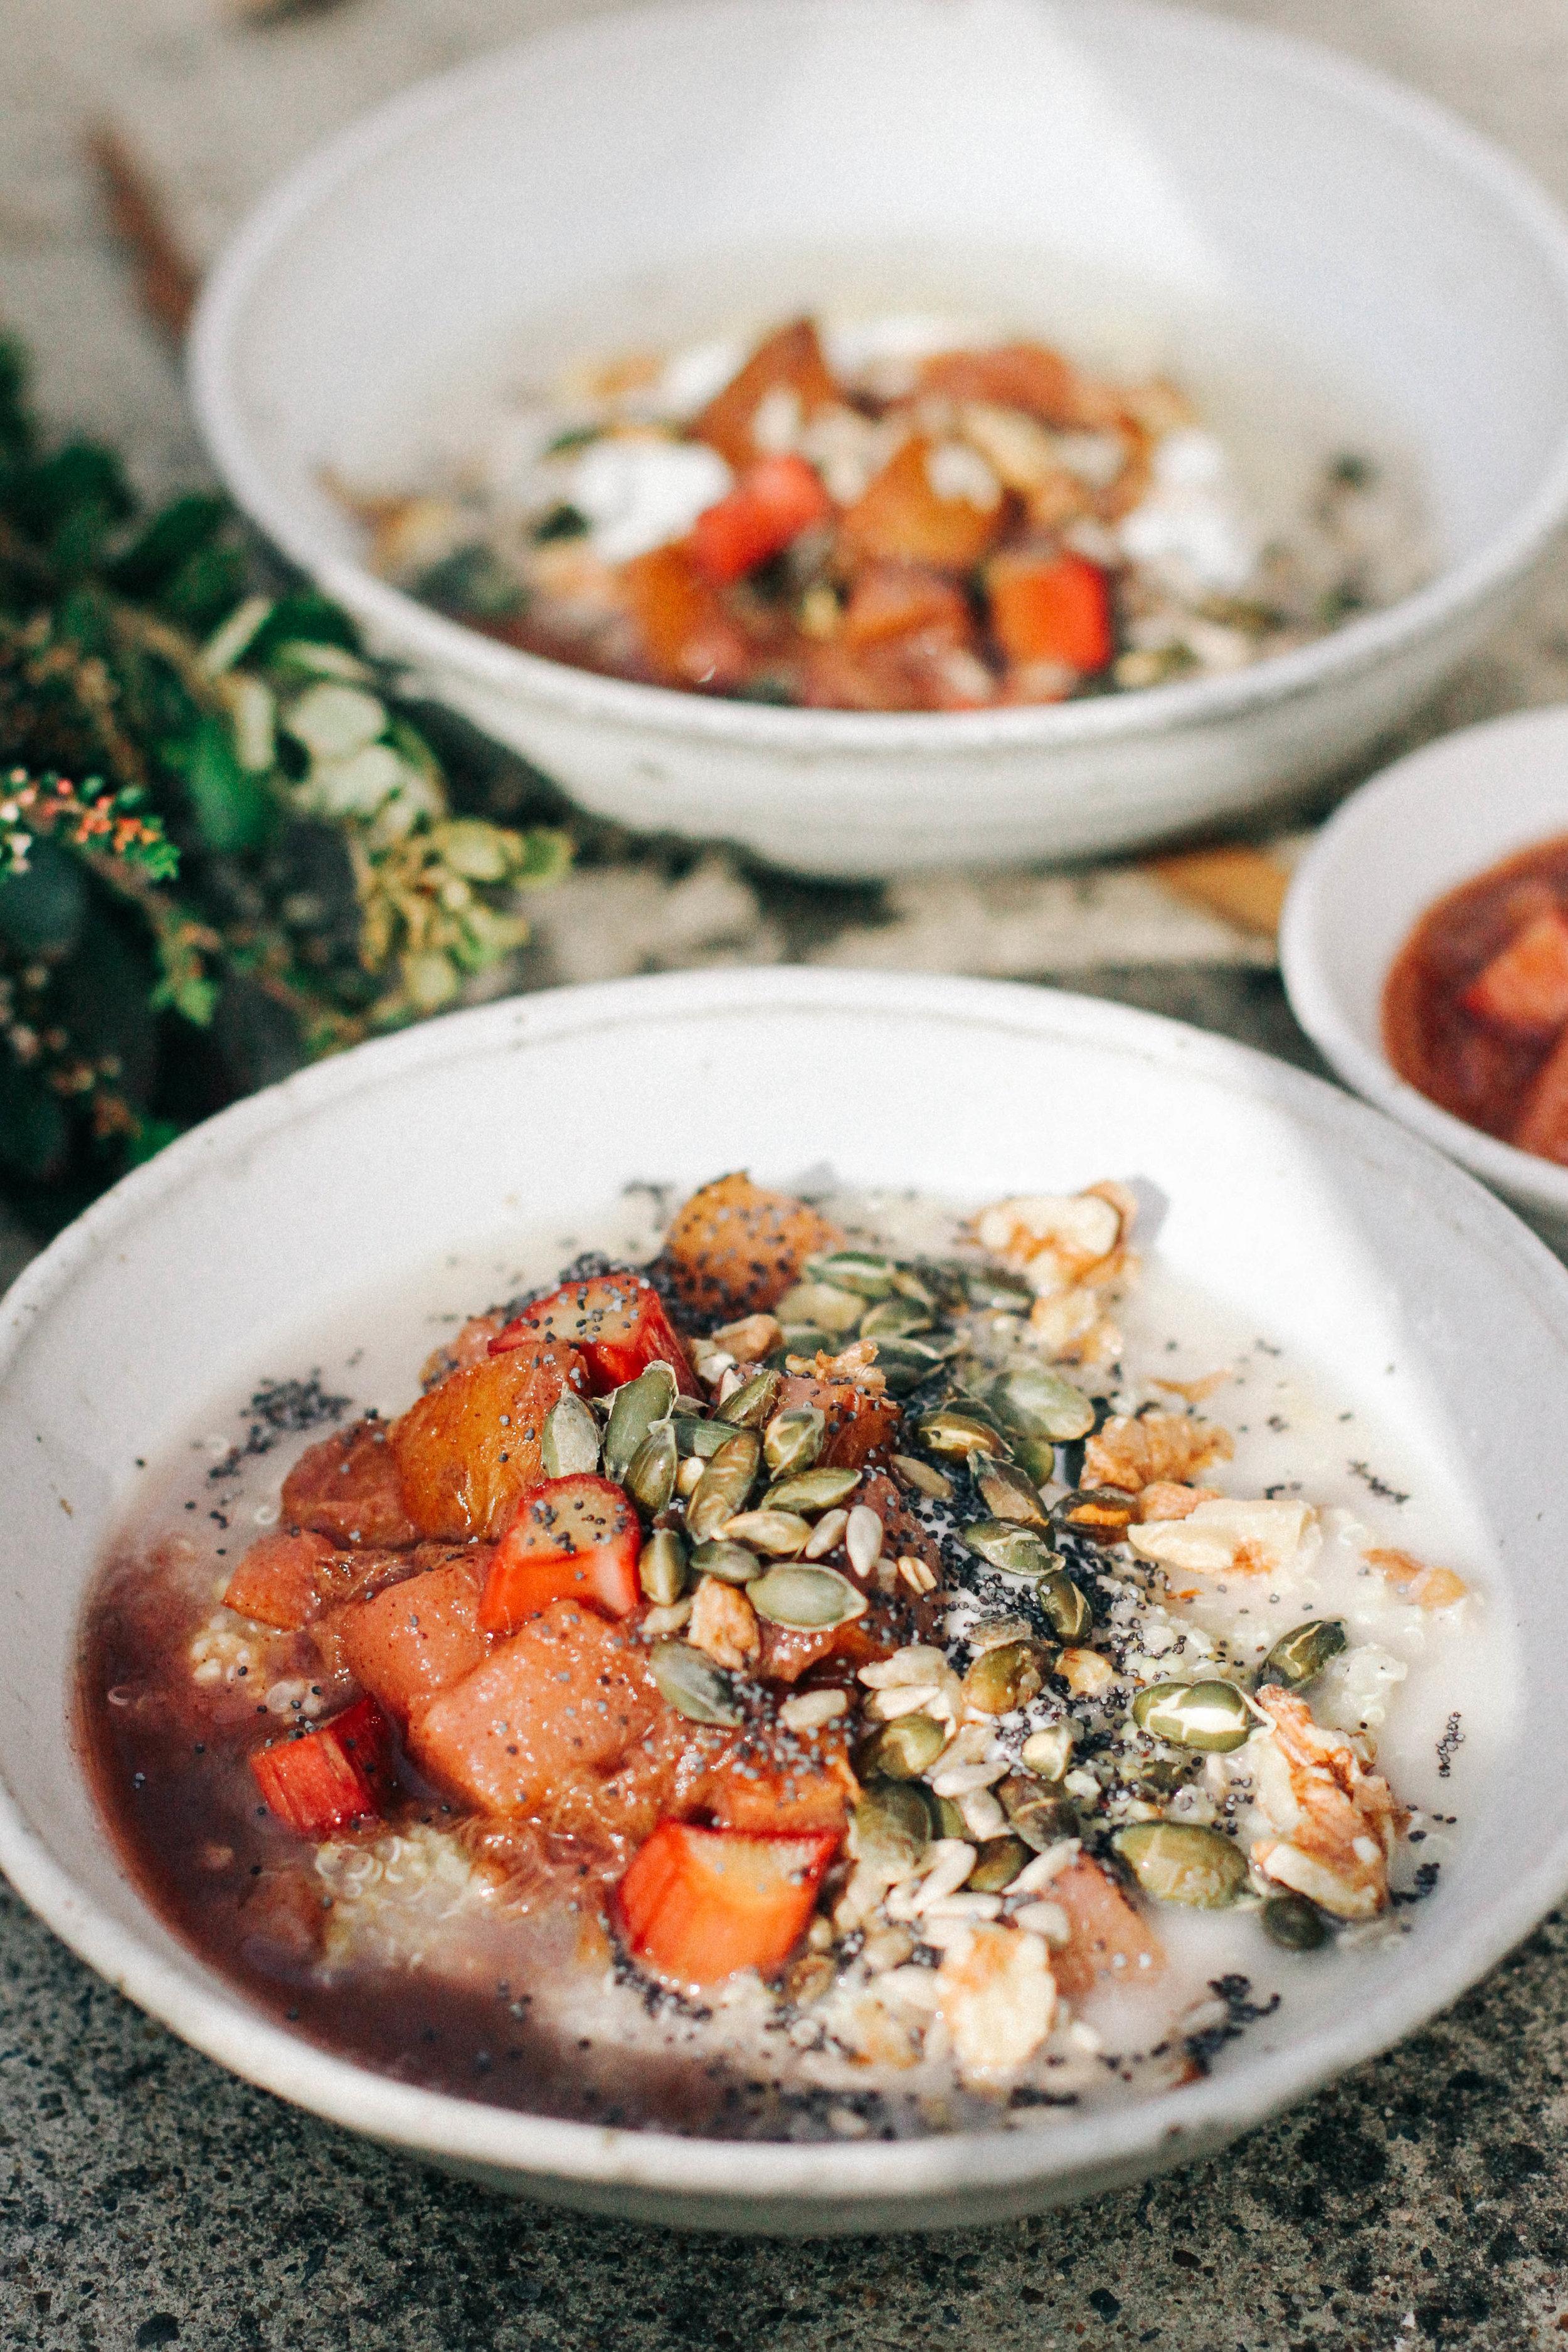 Rhubarb Porridge⎜The Botanical Kitchen